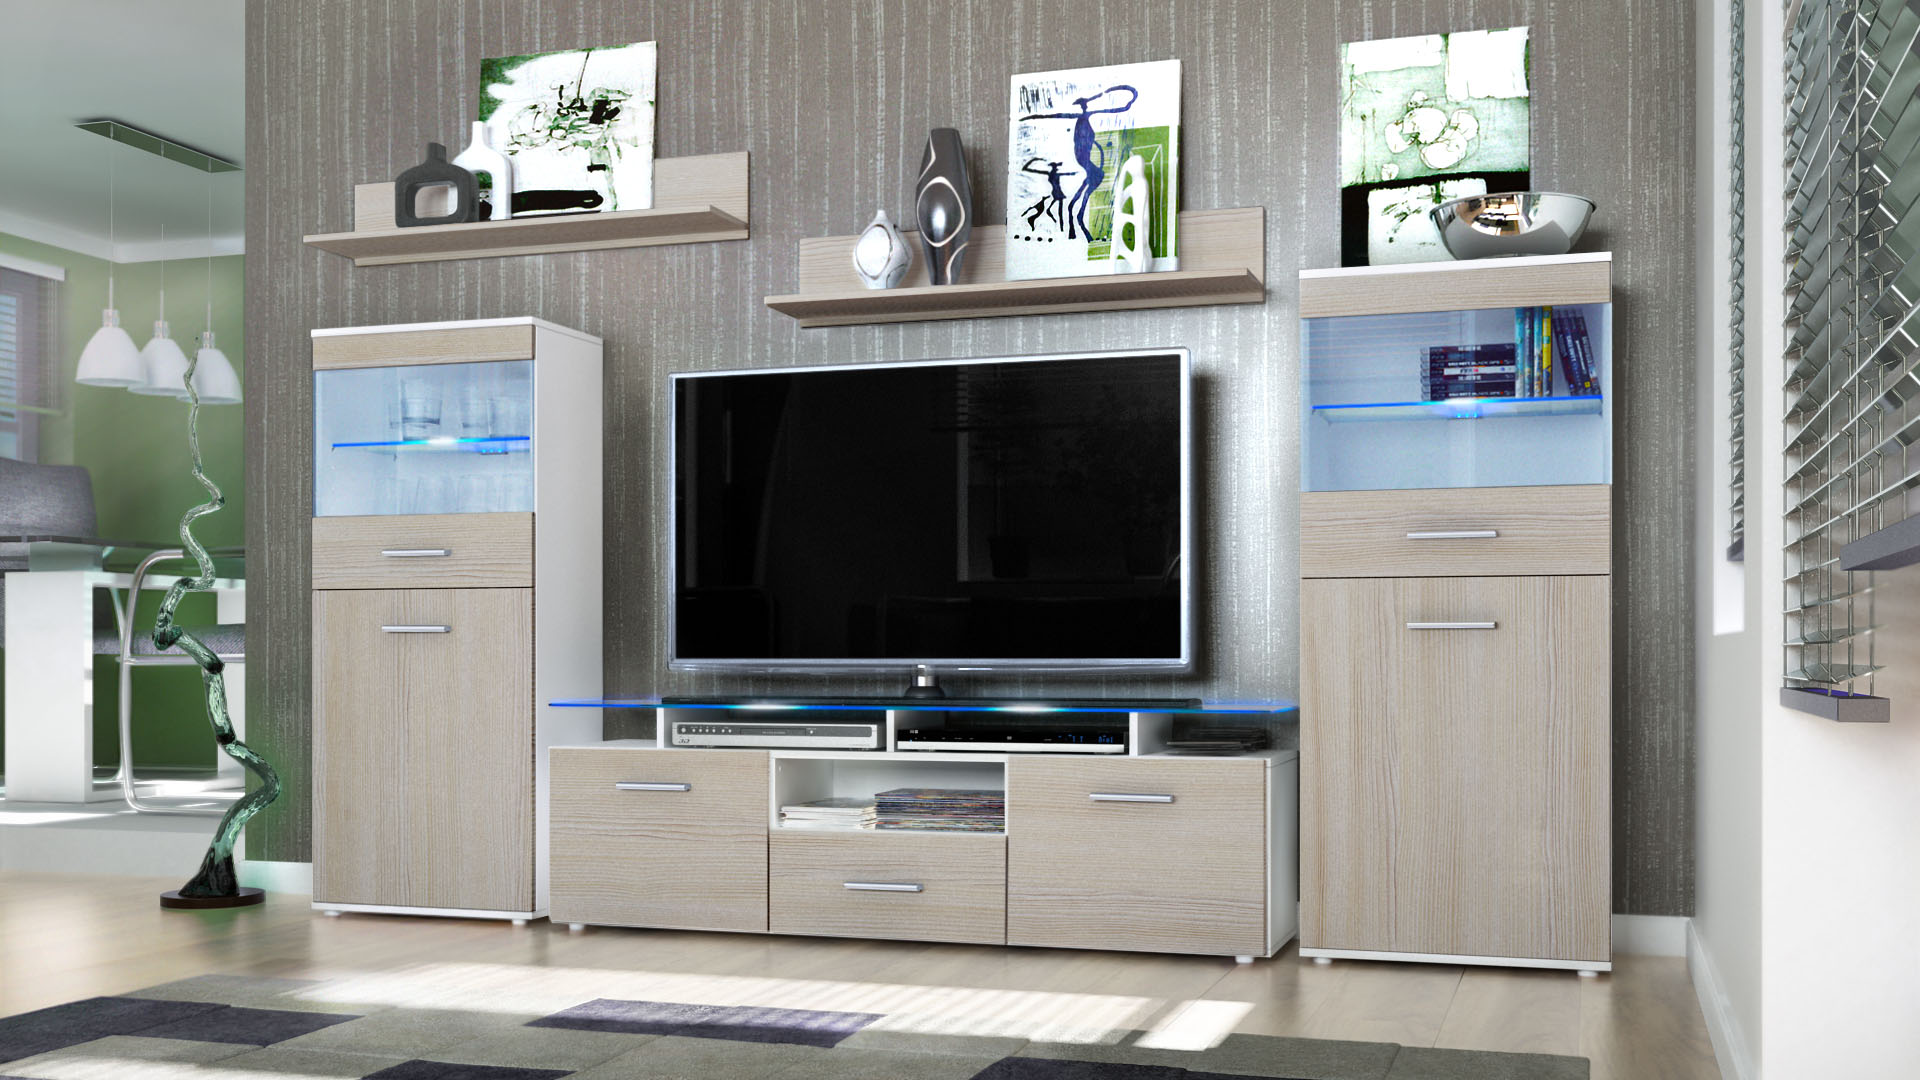 Wall Unit Living Room Furniture Almada White High Gloss Natural Tones Ebay